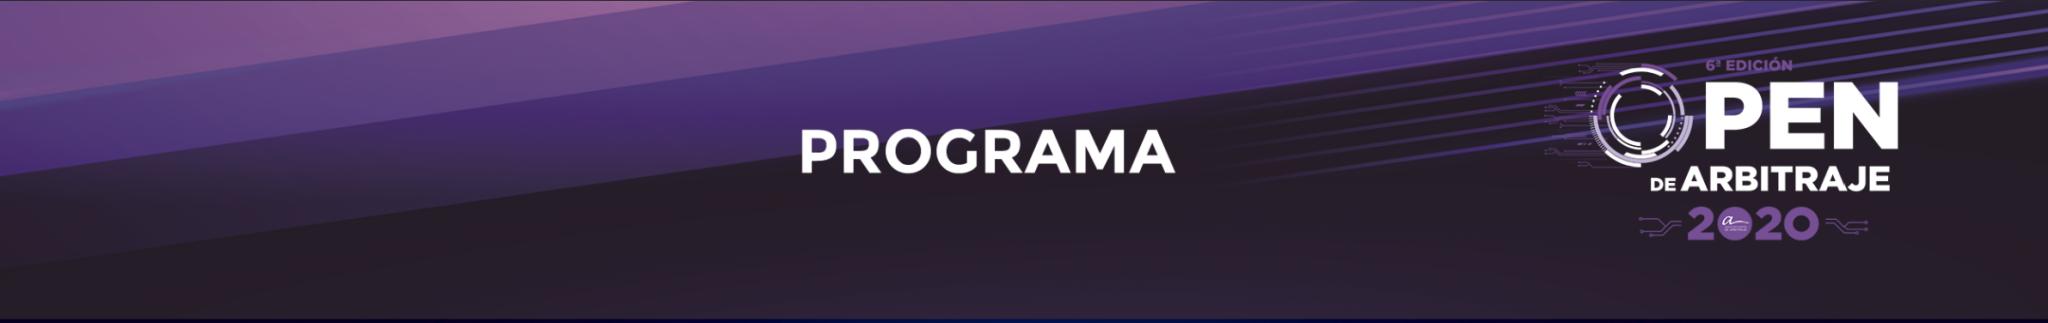 Programa OpenArbitraje2020